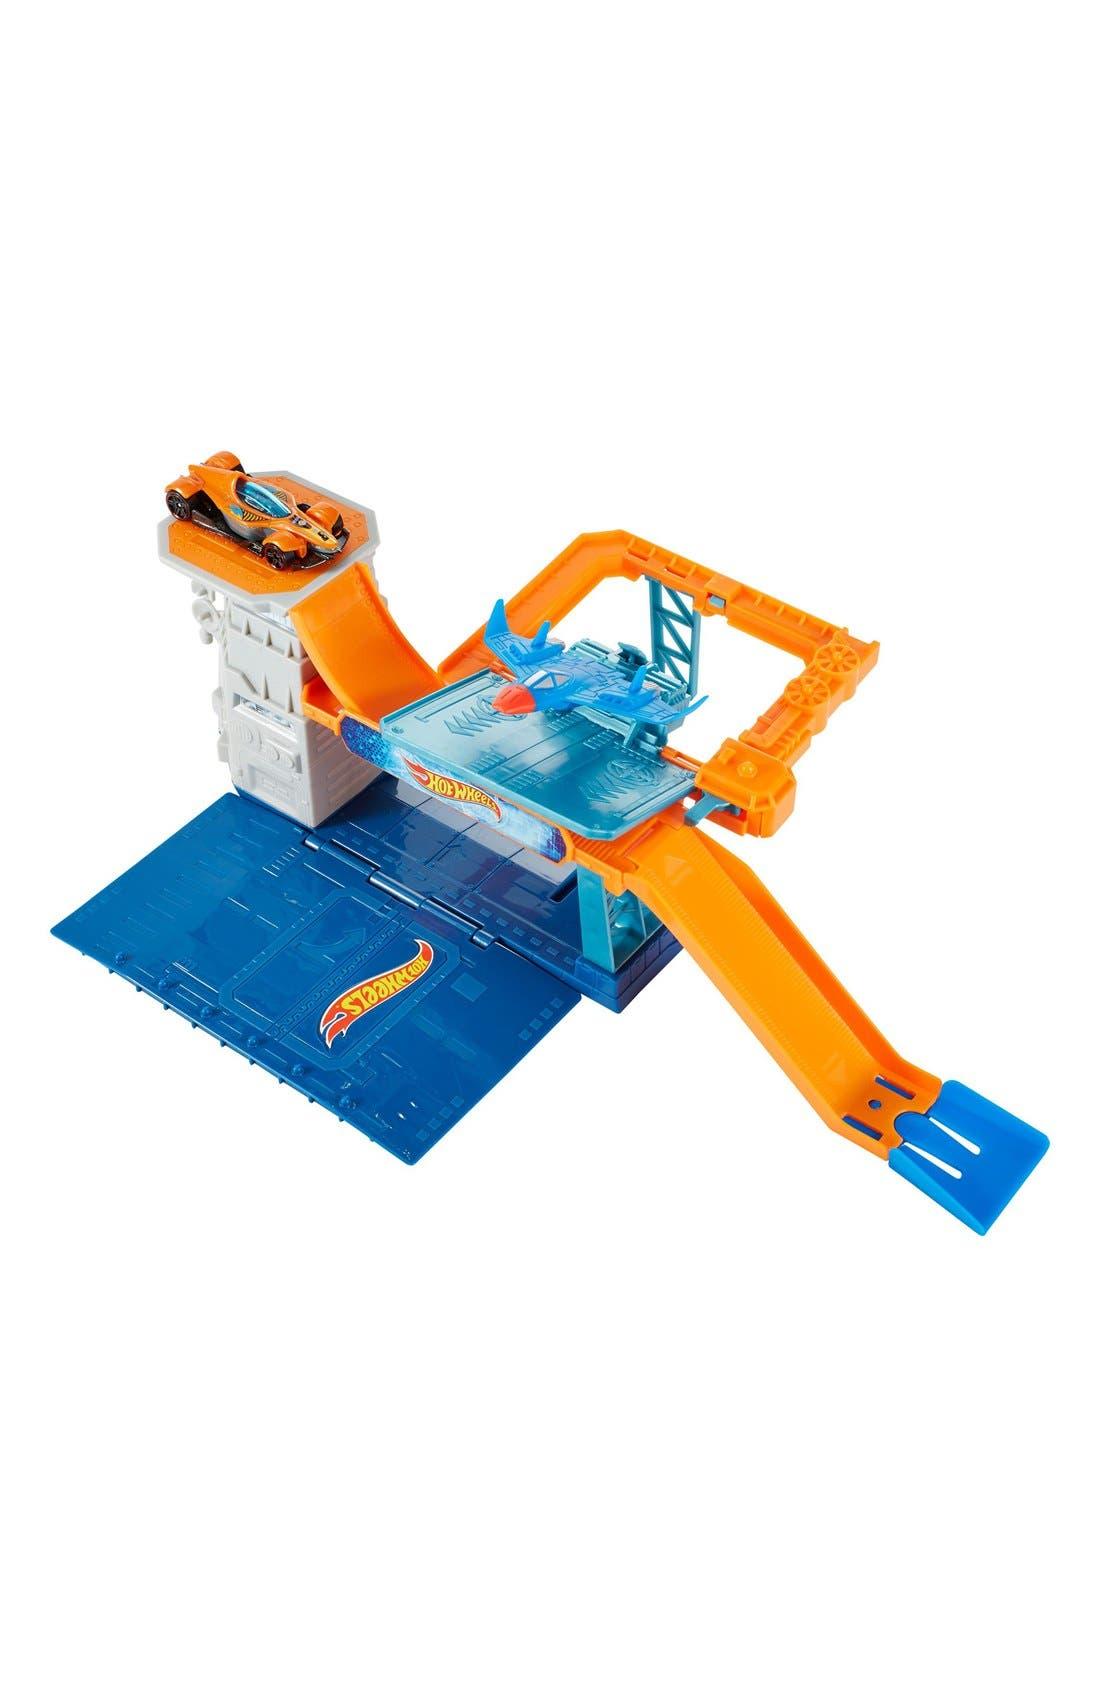 Alternate Image 1 Selected - Mattel Hot Wheels® Sky-Base Blast™ Play Set